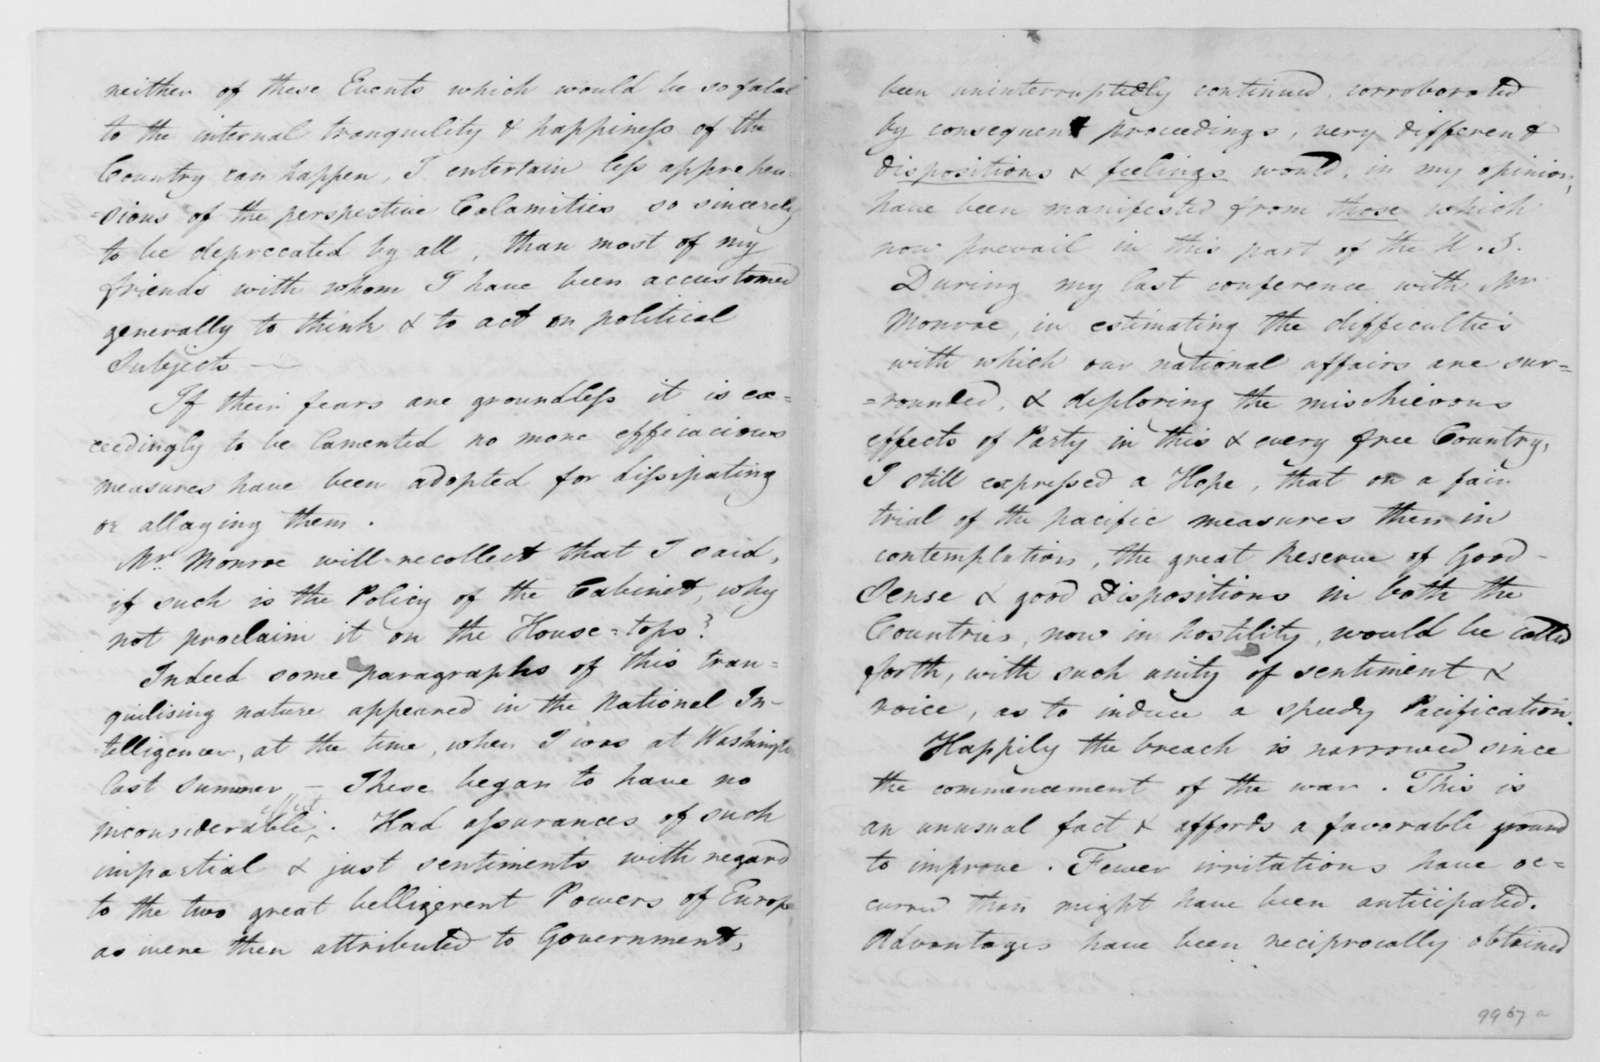 D. Humphreys to James Madison, February 19, 1813.